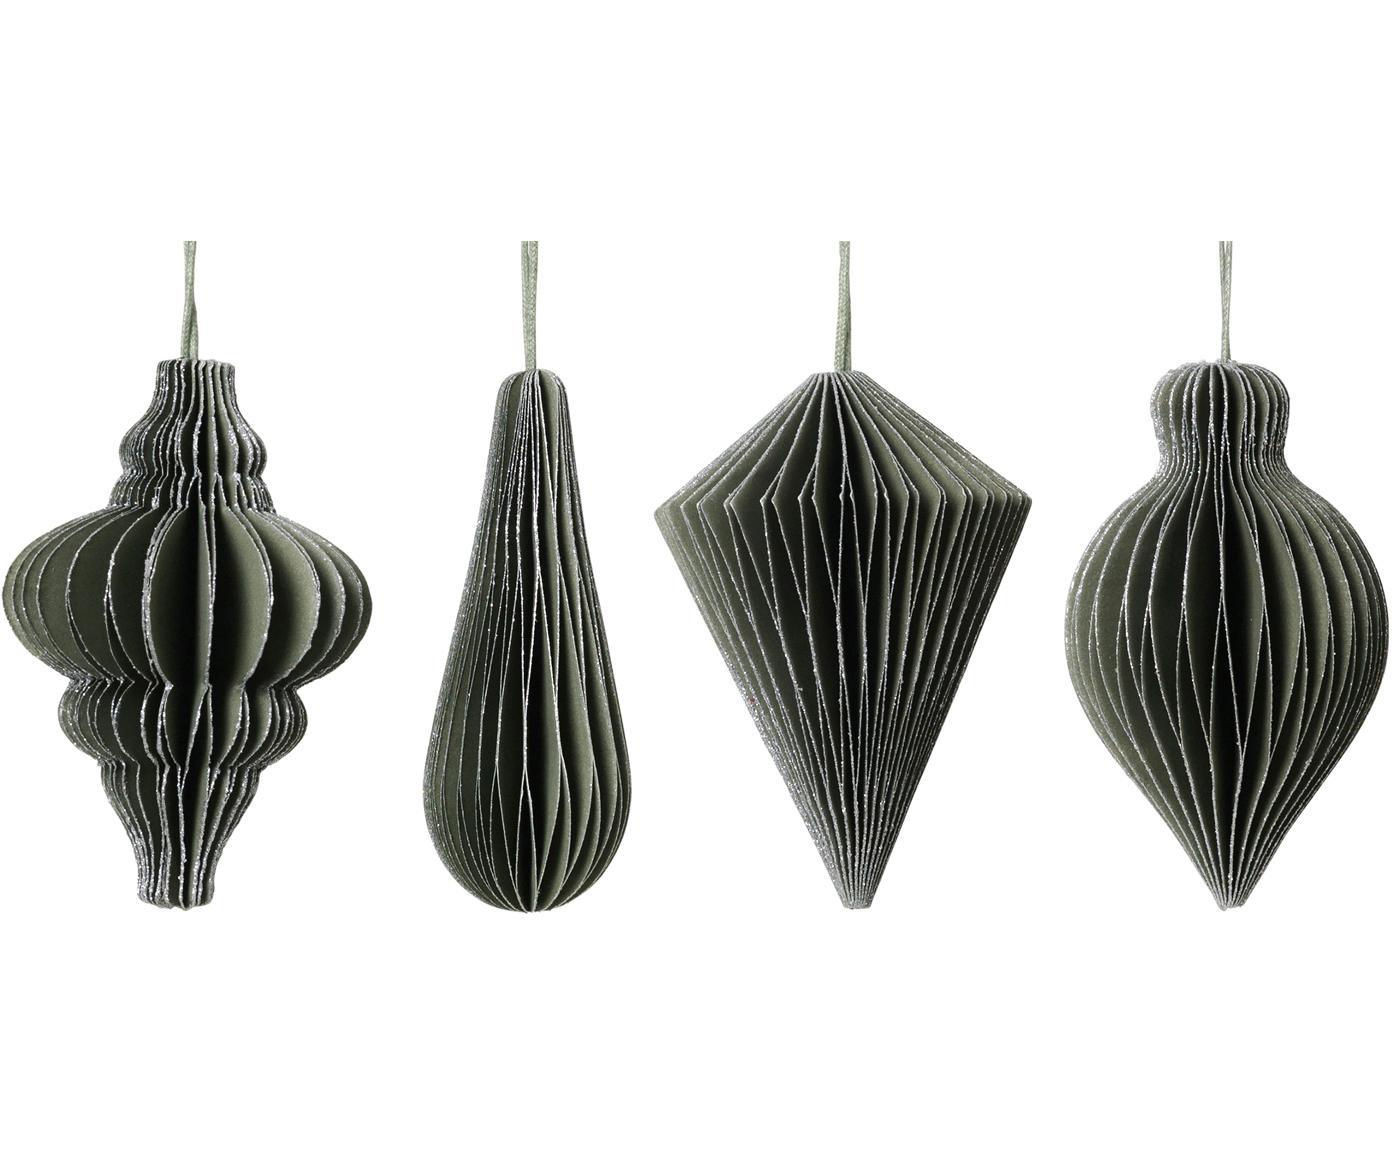 Baumanhänger-Set Winnie, 4-tlg., Papier, Grün, Silberfarben, Ø 5 x H 7 cm